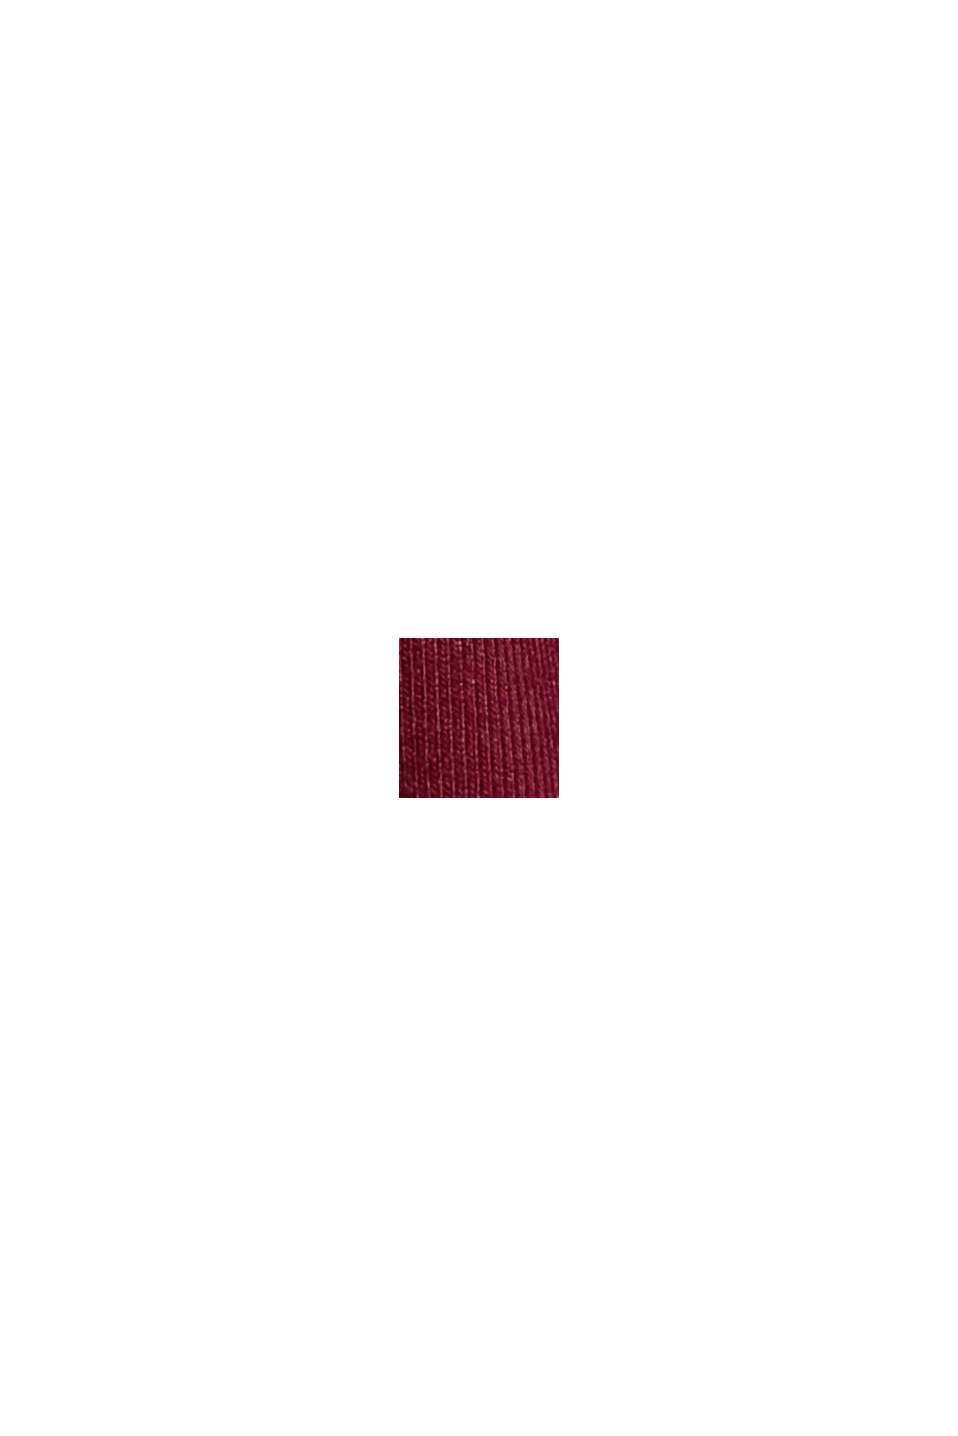 Jersey-Top mit Satinblende, BORDEAUX RED, swatch